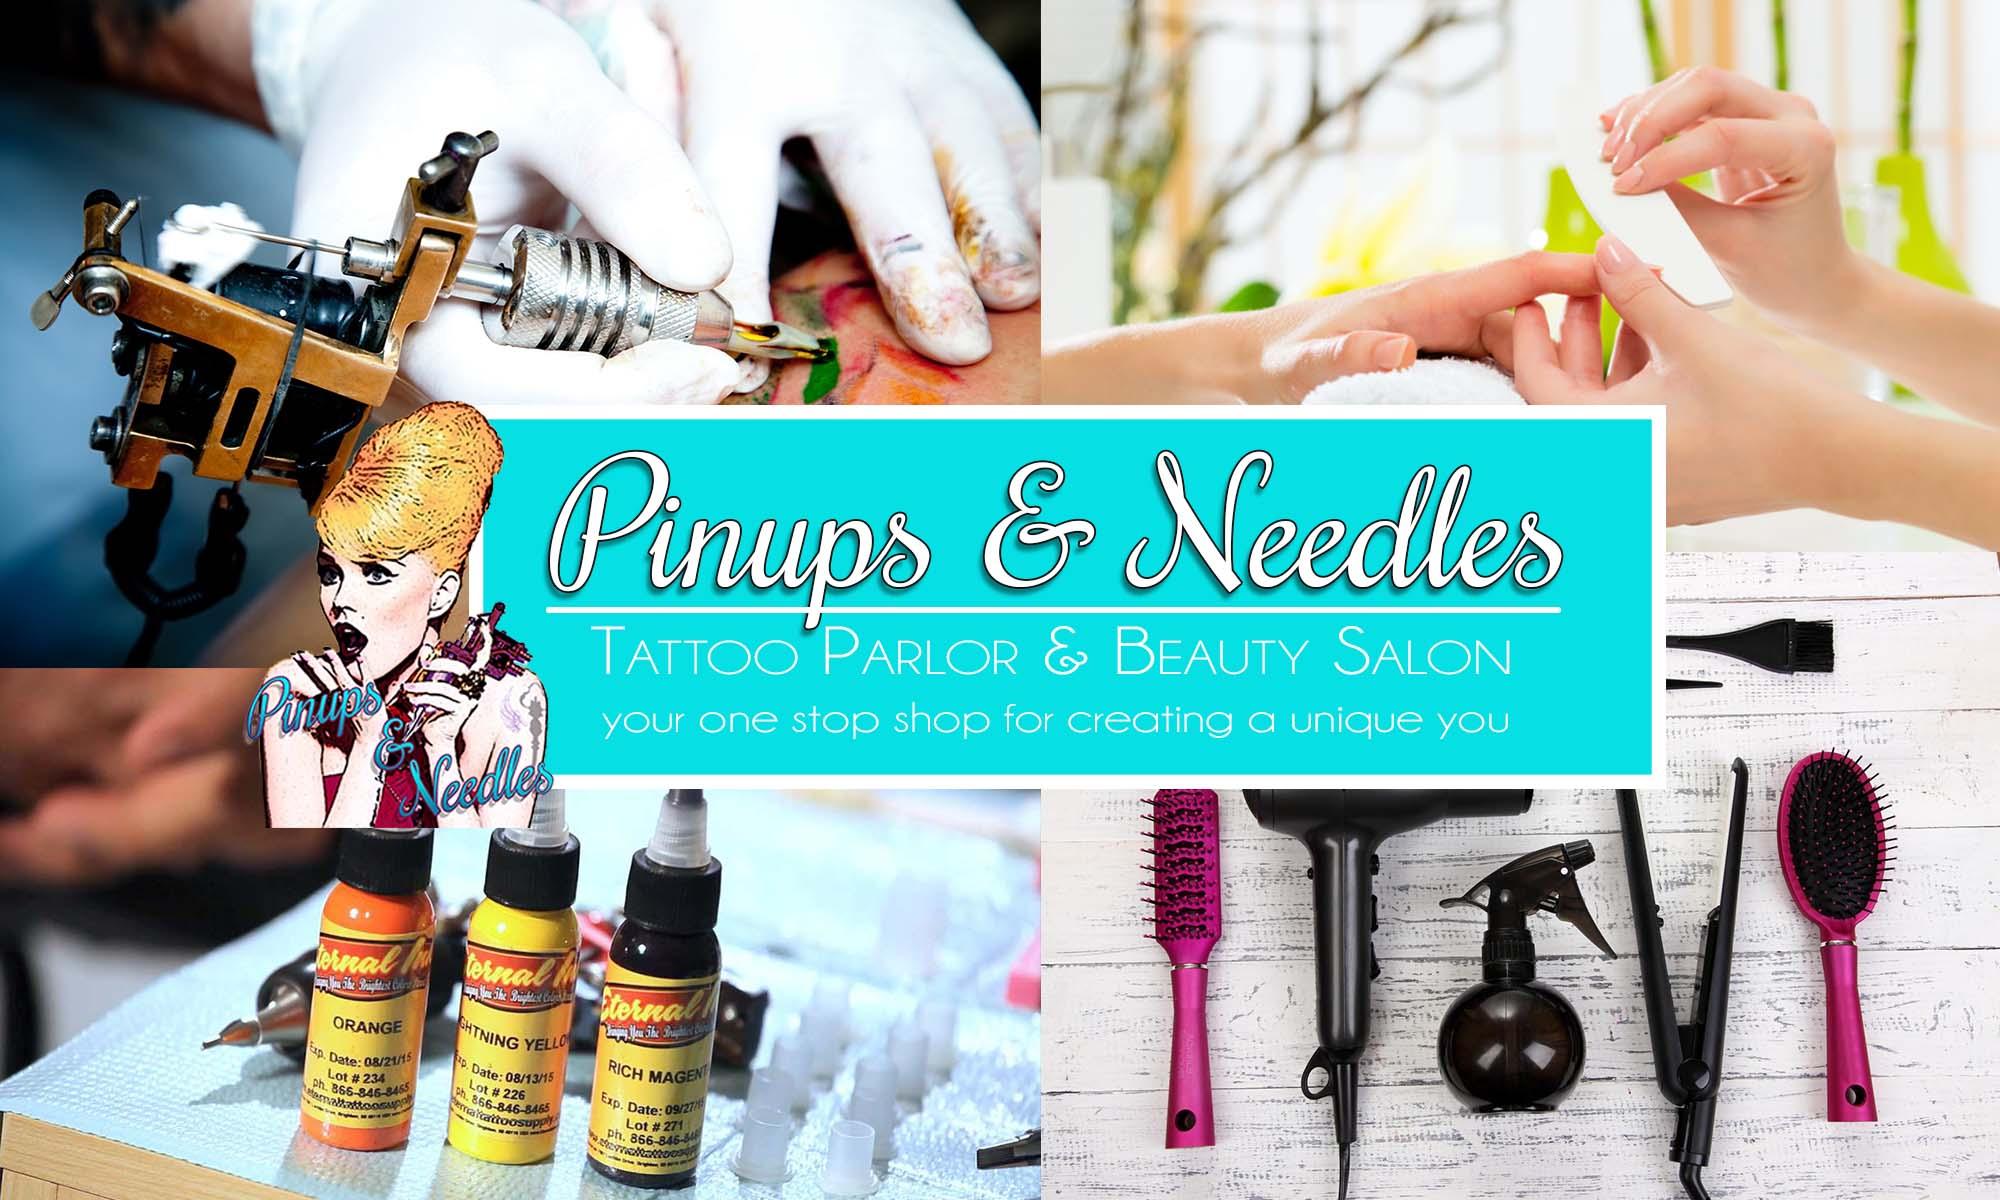 Pinups & Needles